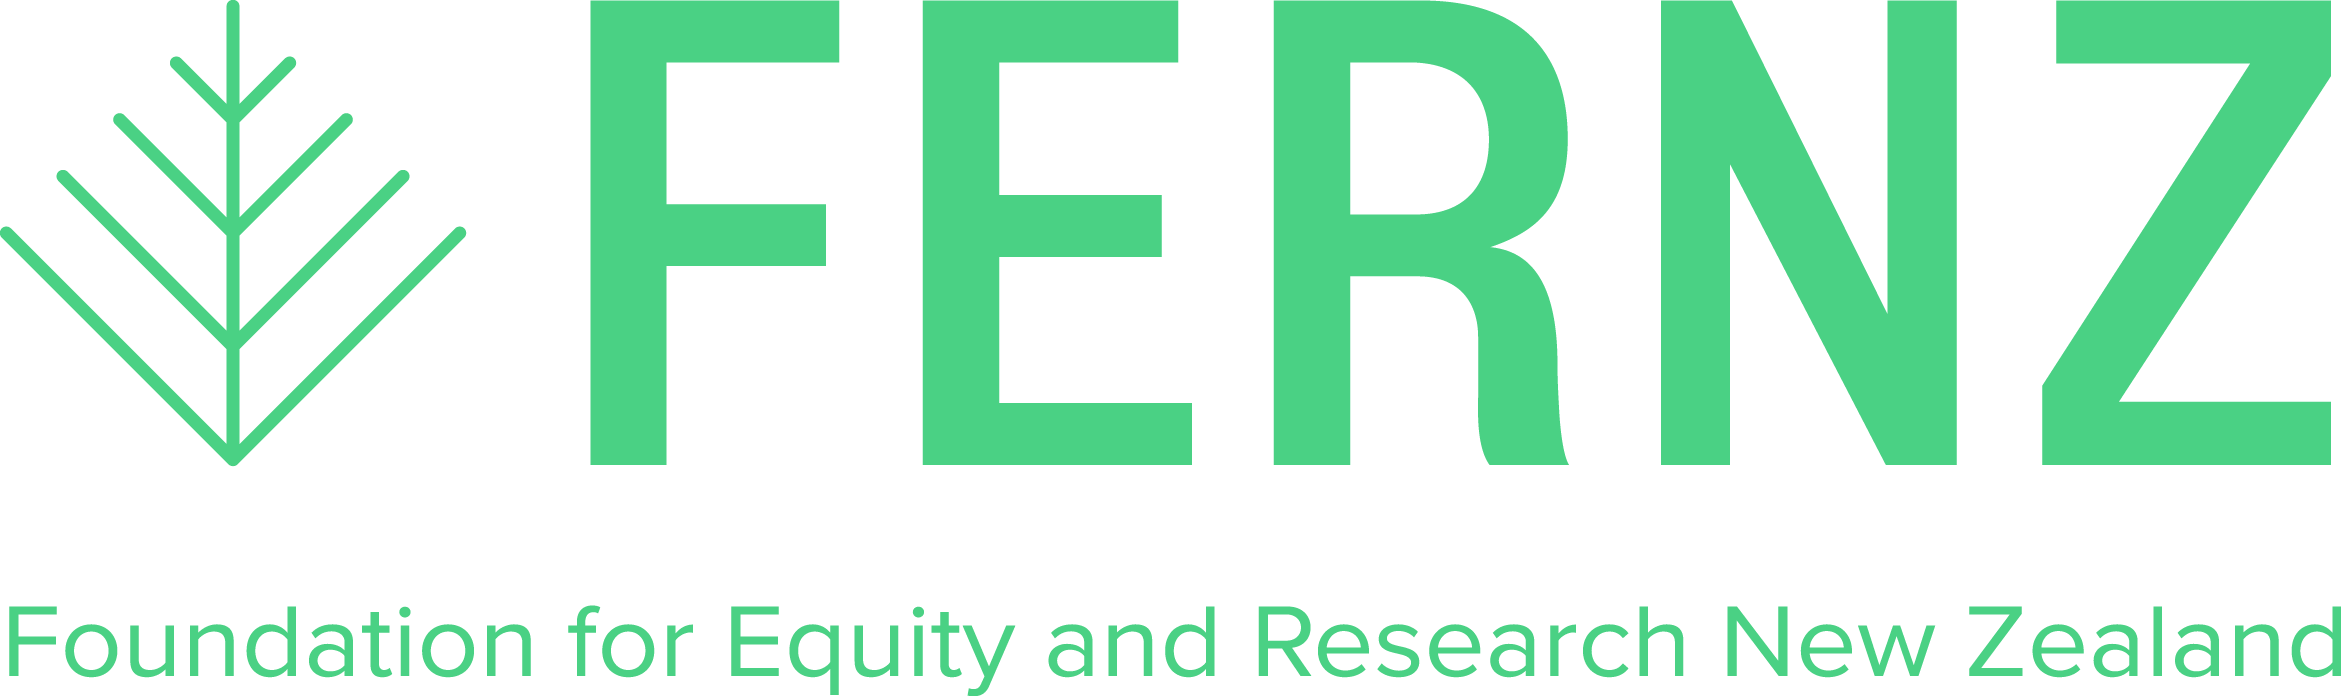 FERNZ logo_RGB_green.png